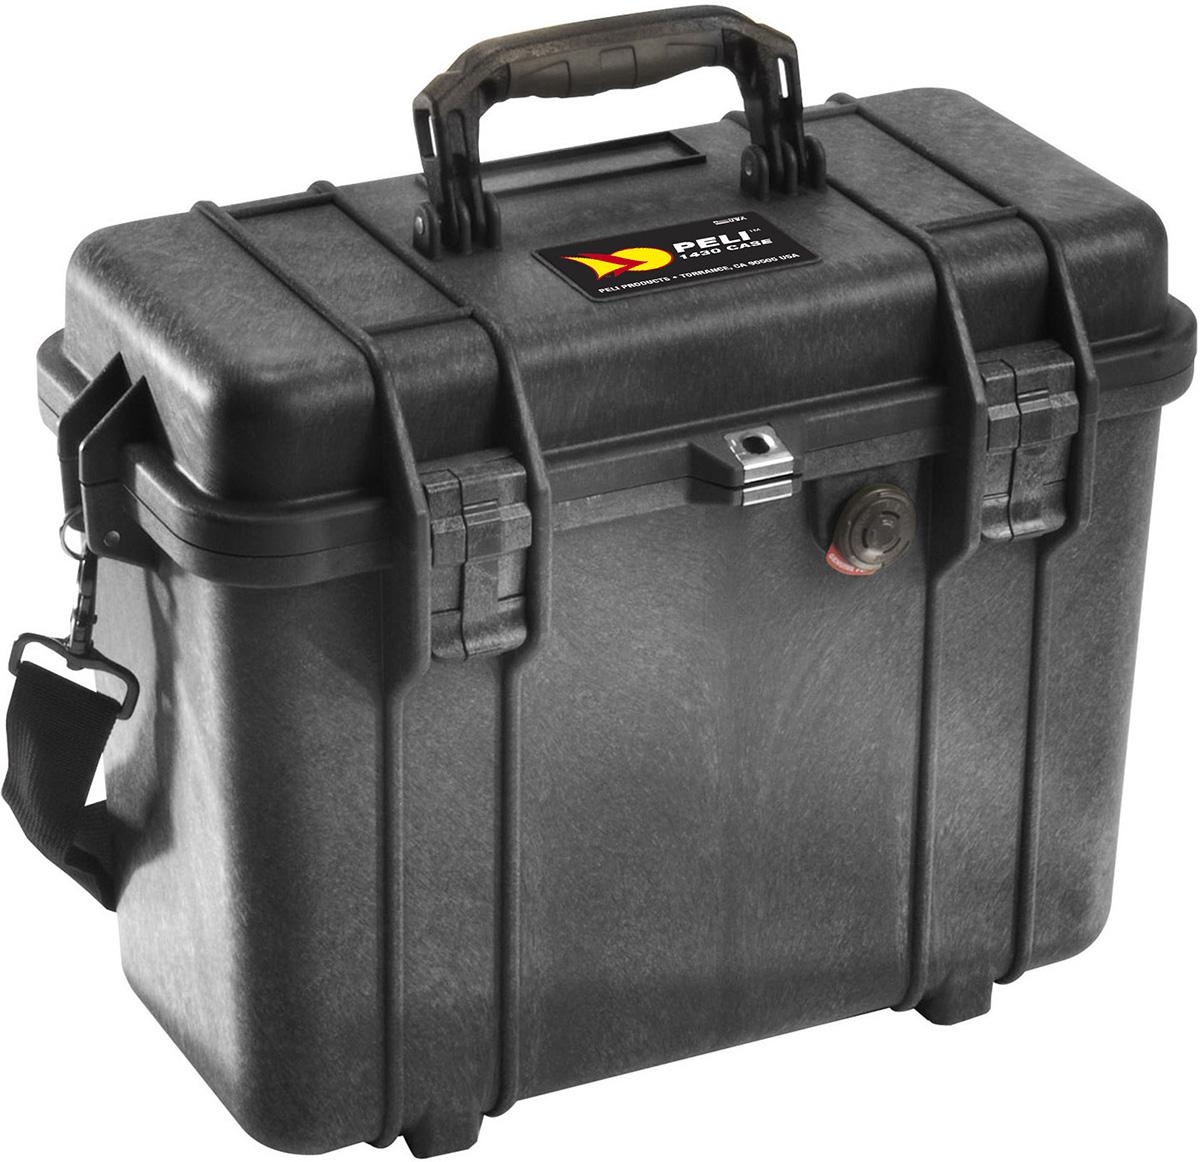 peli 1430 motorcycle top loader hard case